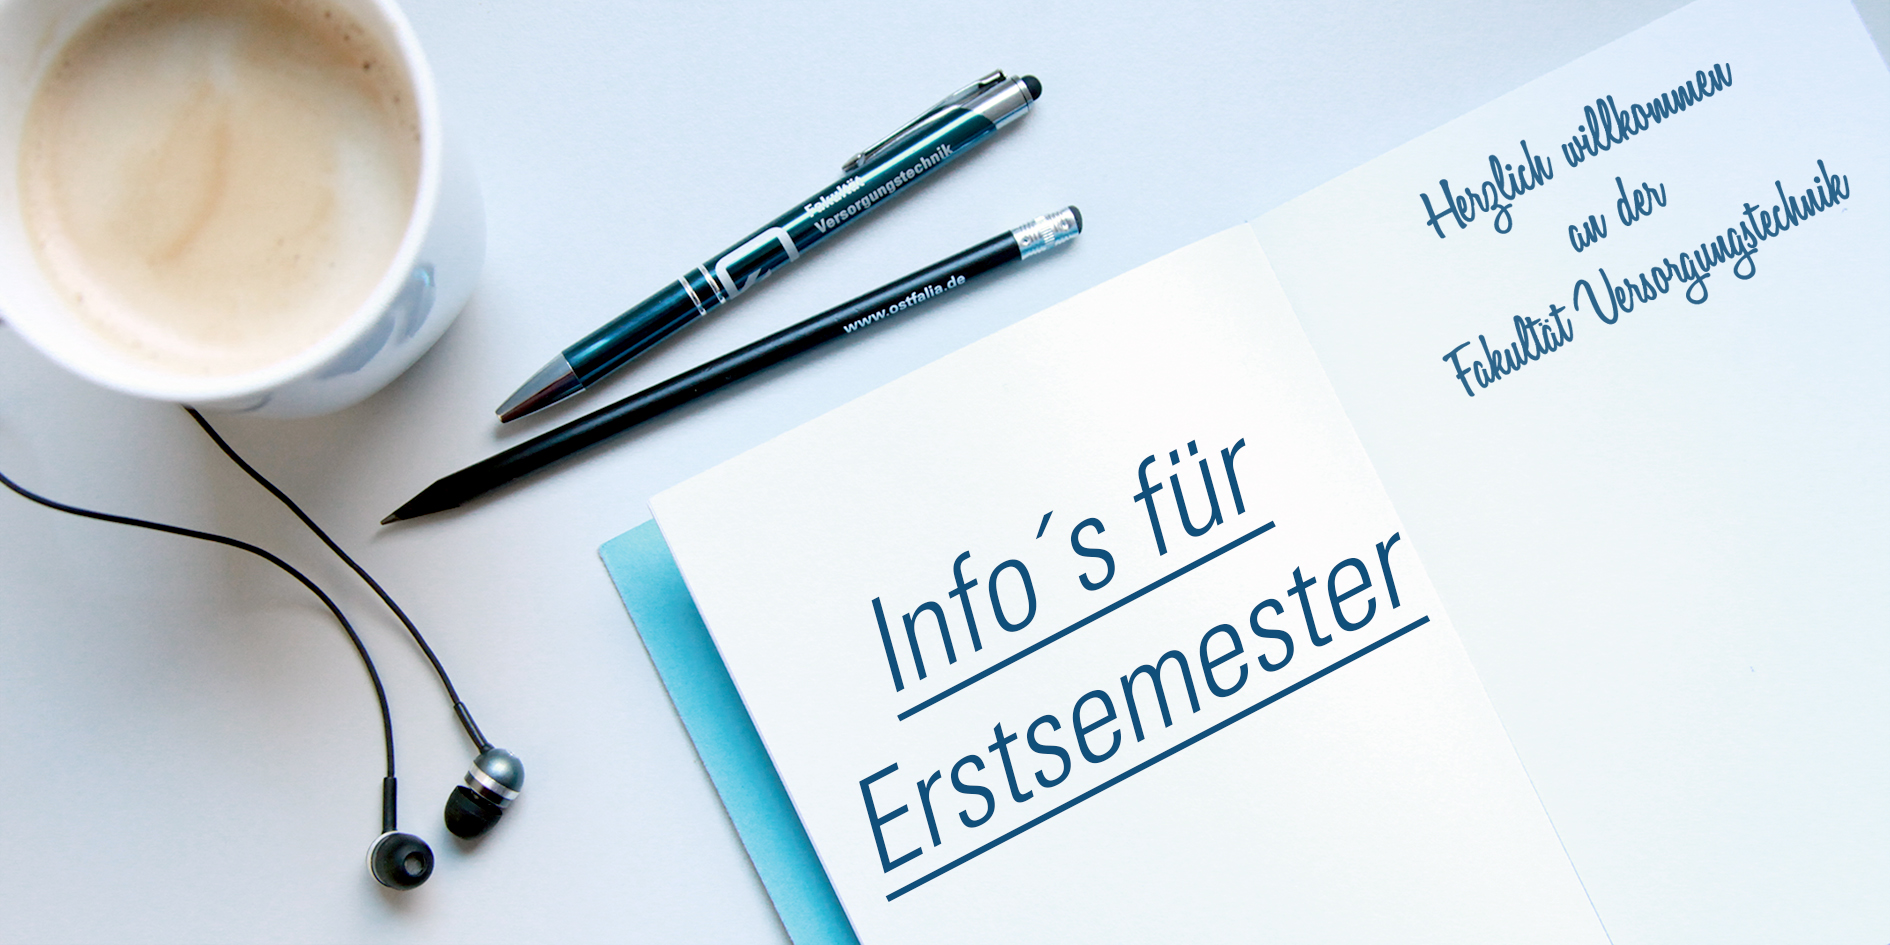 Charmant Job Beginnt Für Erstsemester Galerie - Entry Level Resume ...